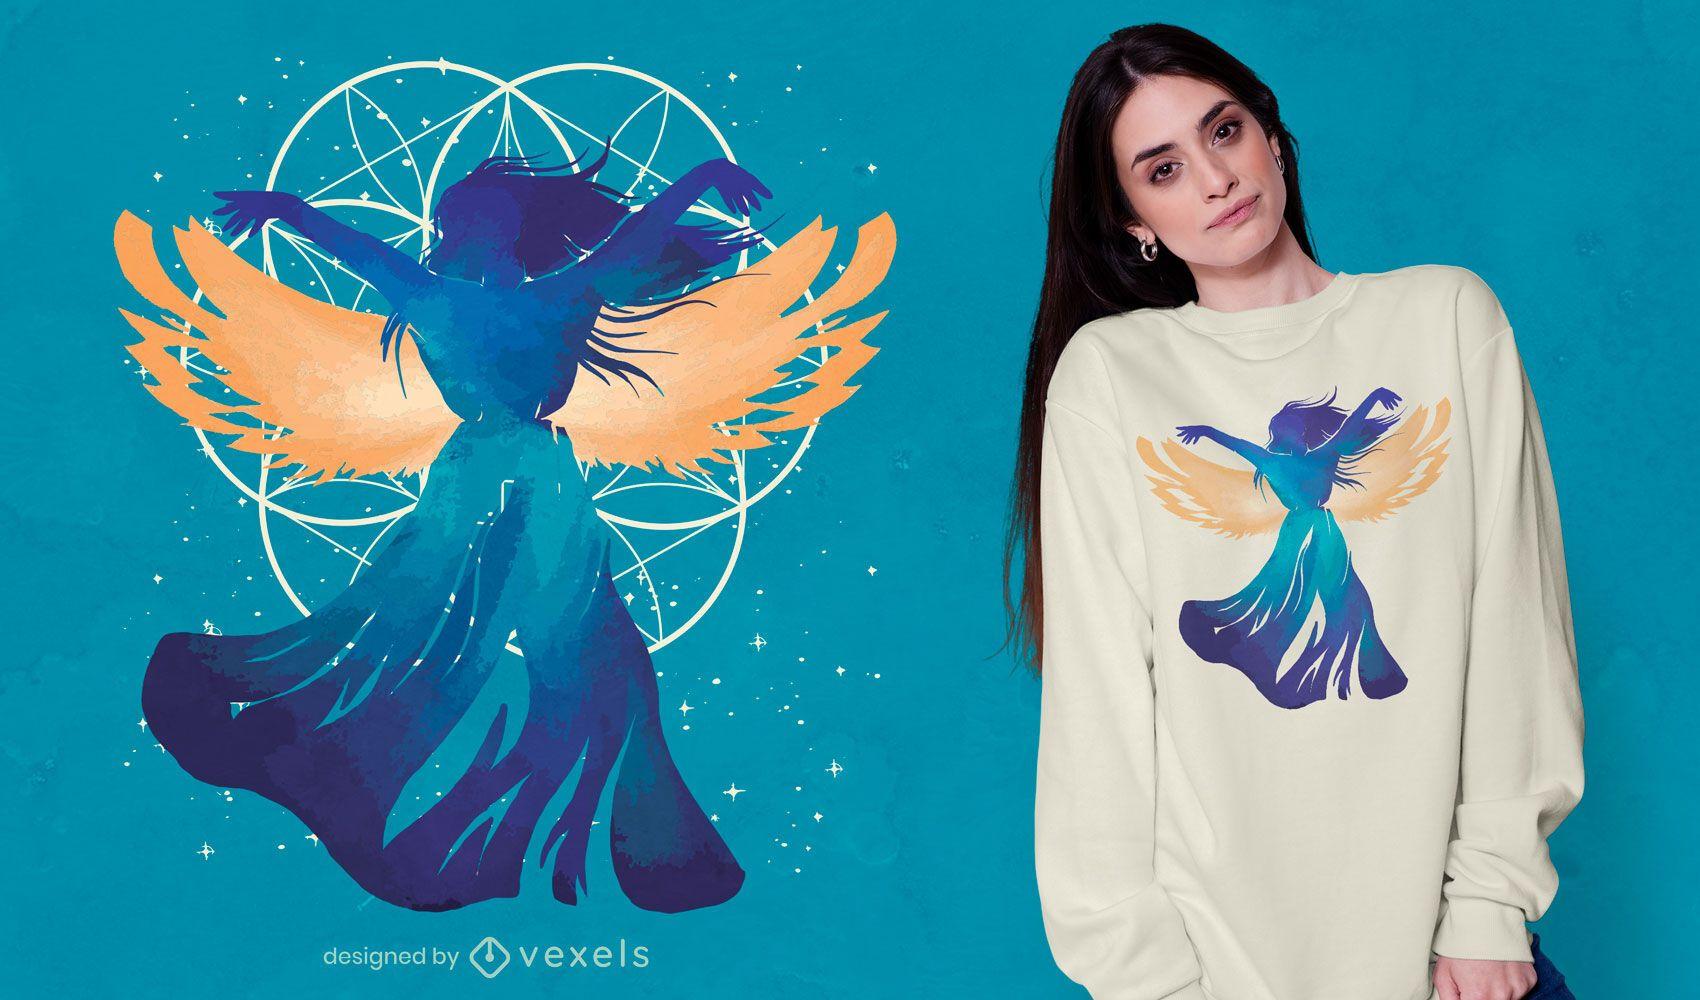 Angel woman fantasy t-shirt design